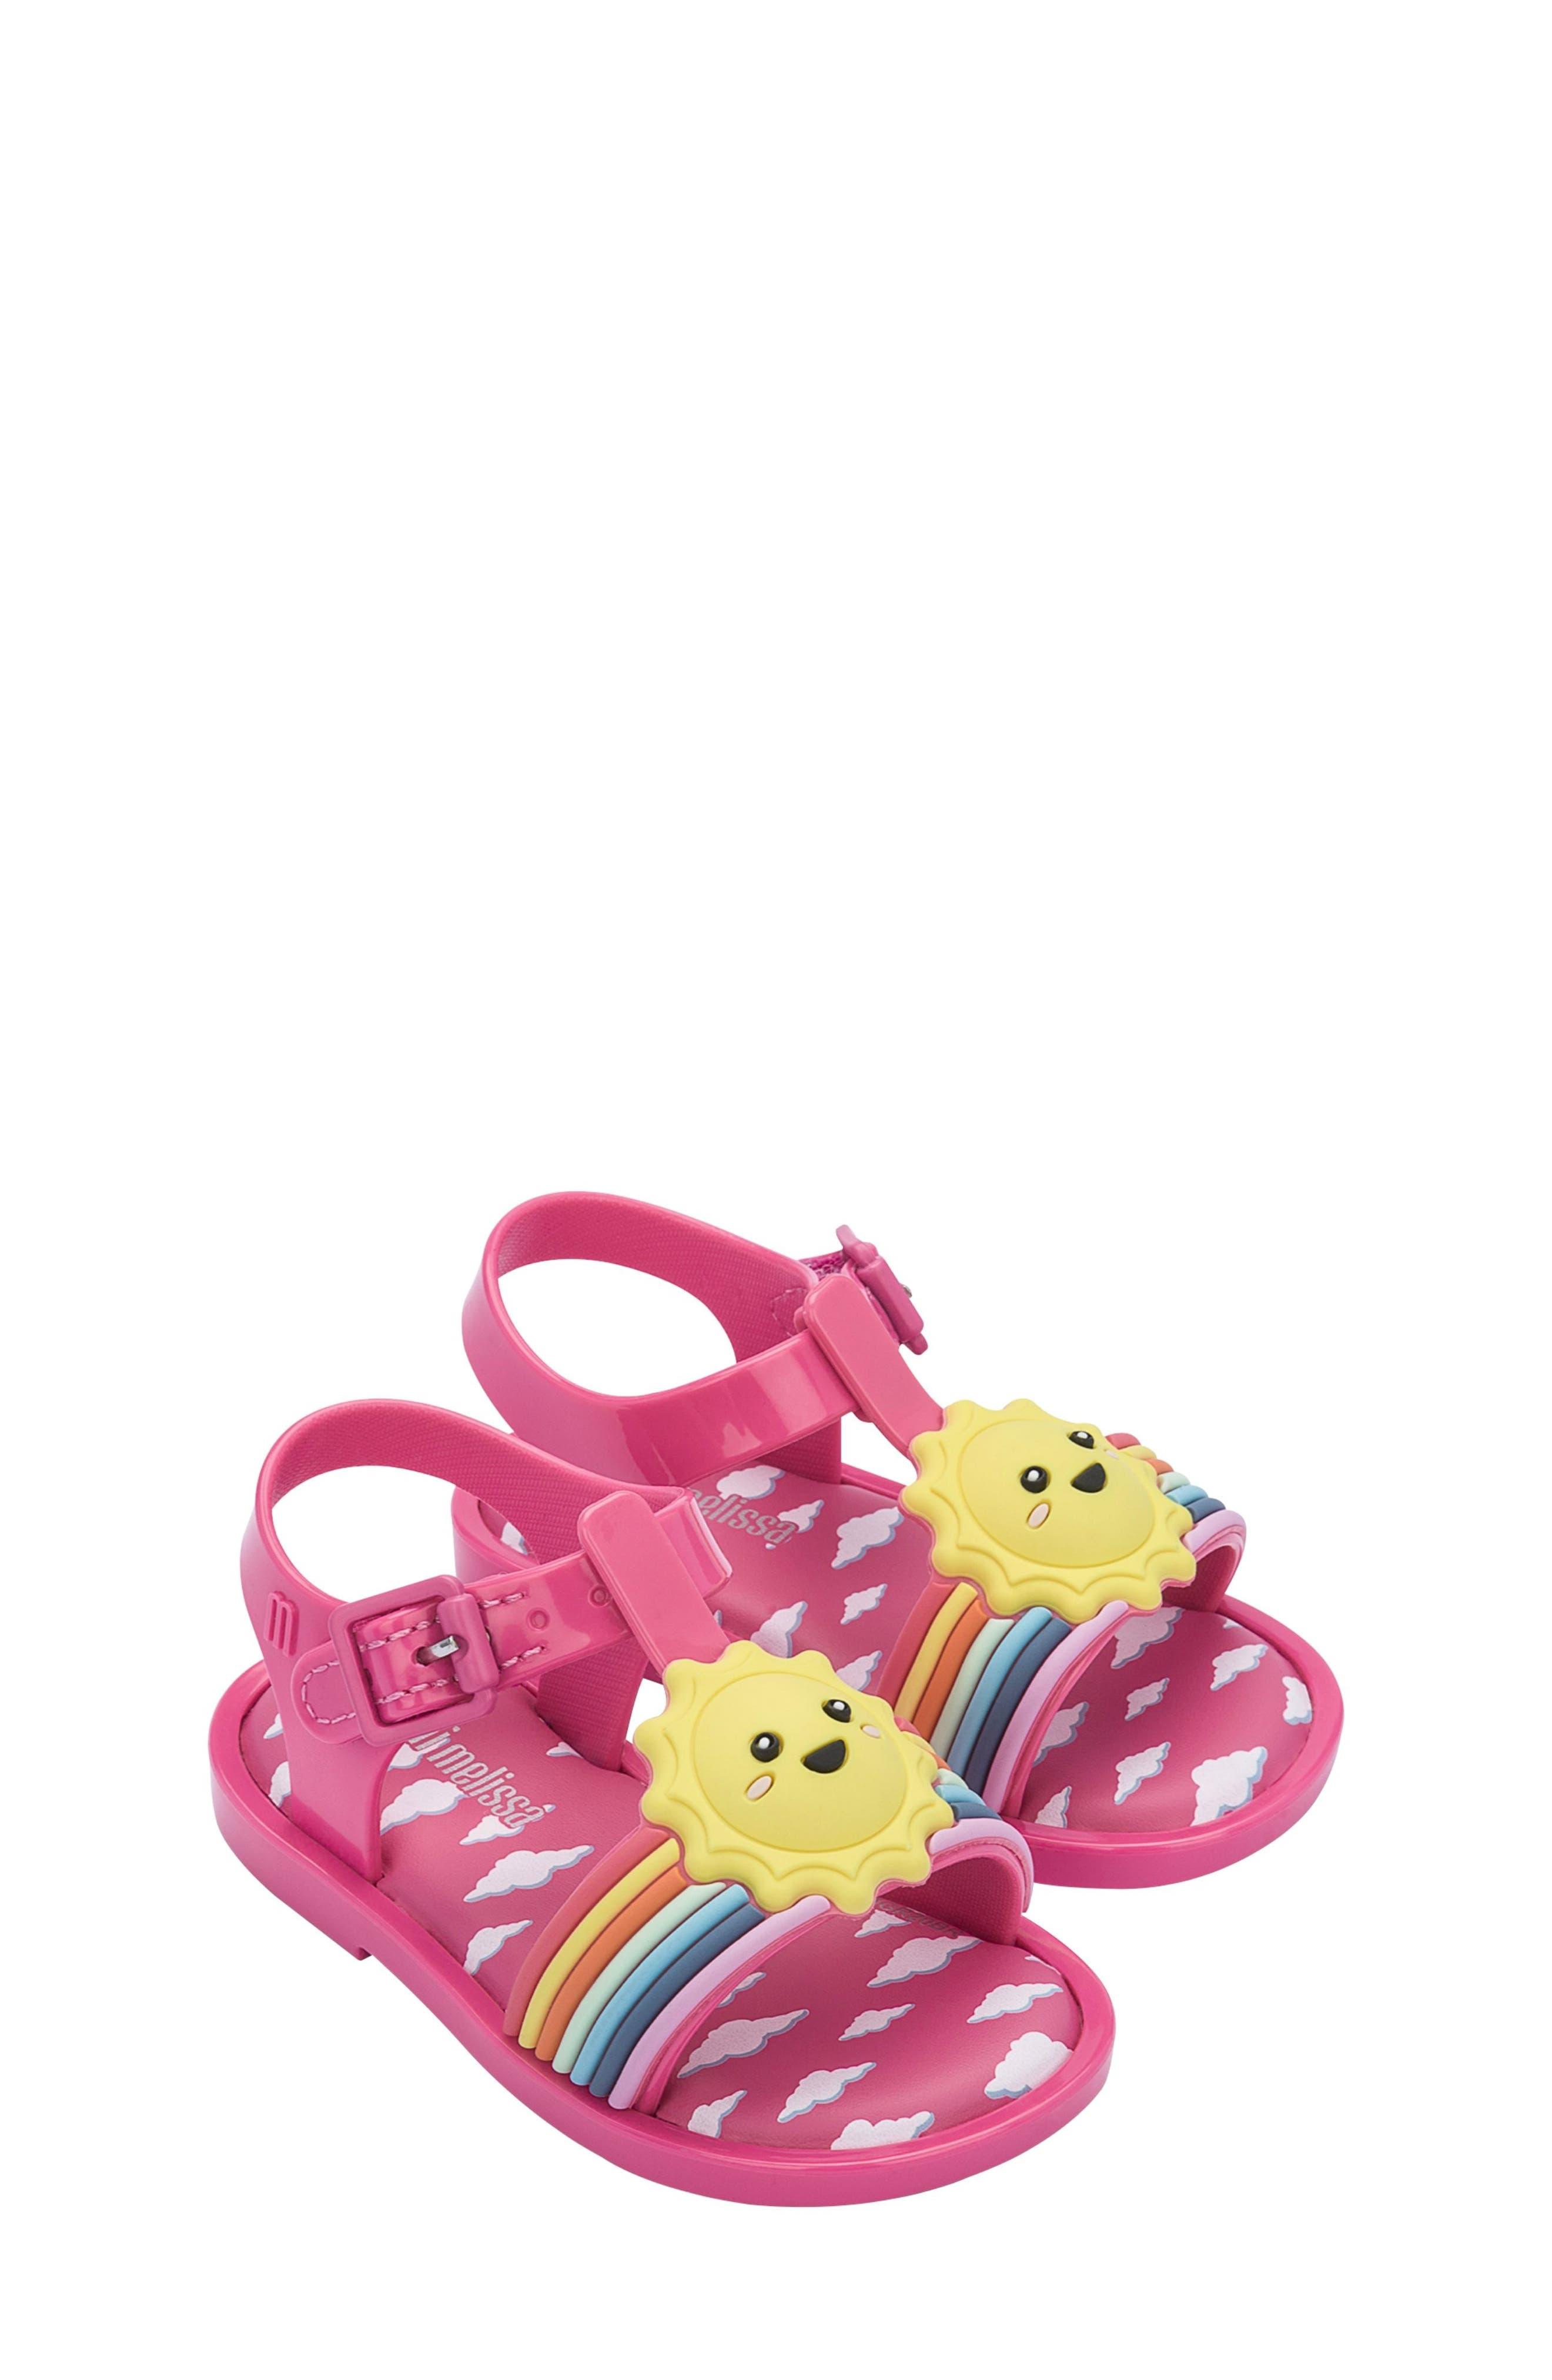 NEW Carter/'s Girls 3T 5T 4//5 6//6x 7 year Pink Glitter Hearts @ Knees Sweatpants